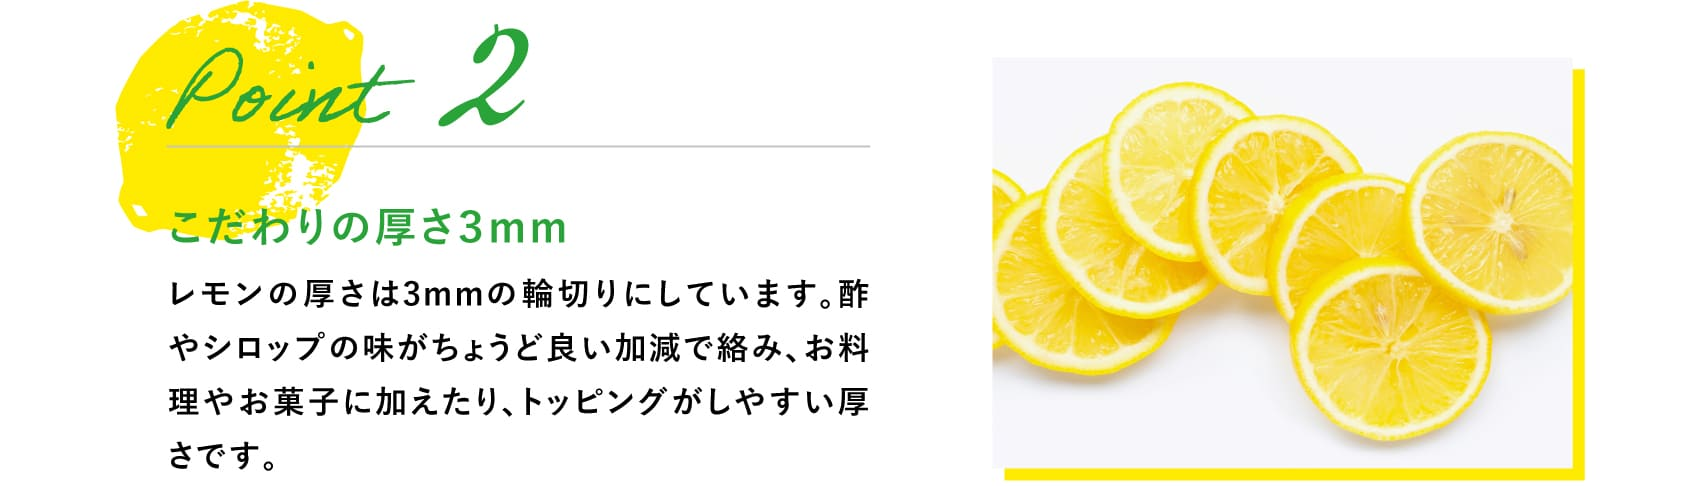 pc用レモン輪切り